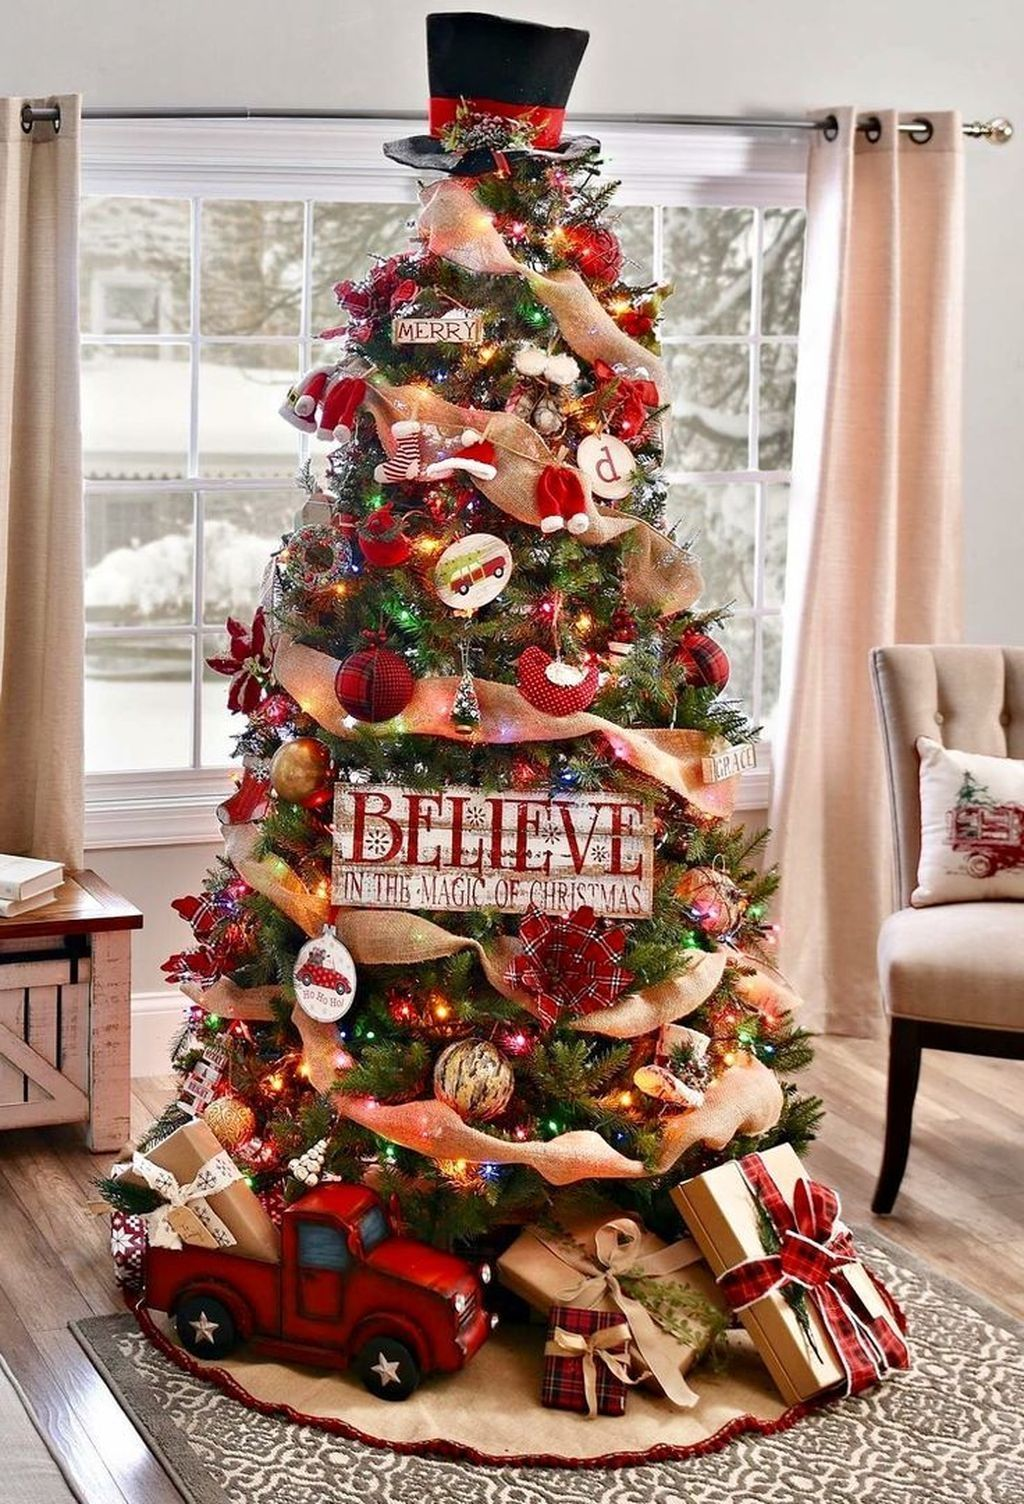 20 Pretty Rustic Christmas Tree Decoration Ideas Trendhmdcr Christmas Decorations Rustic Tree Cool Christmas Trees Rustic Christmas Tree